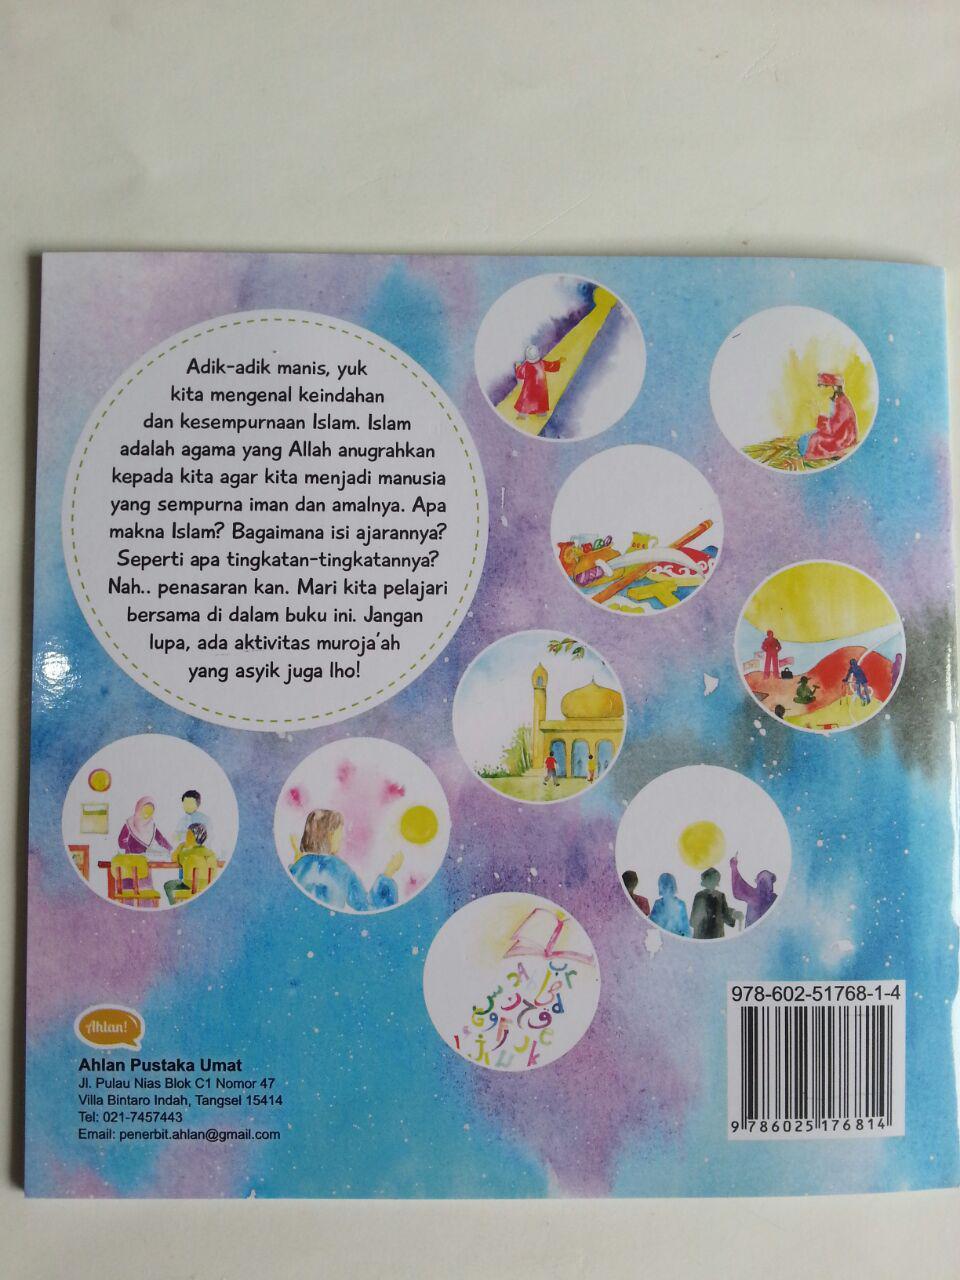 Buku Anak Ushul Tsalatsah For Kids Mengenal Islam cover